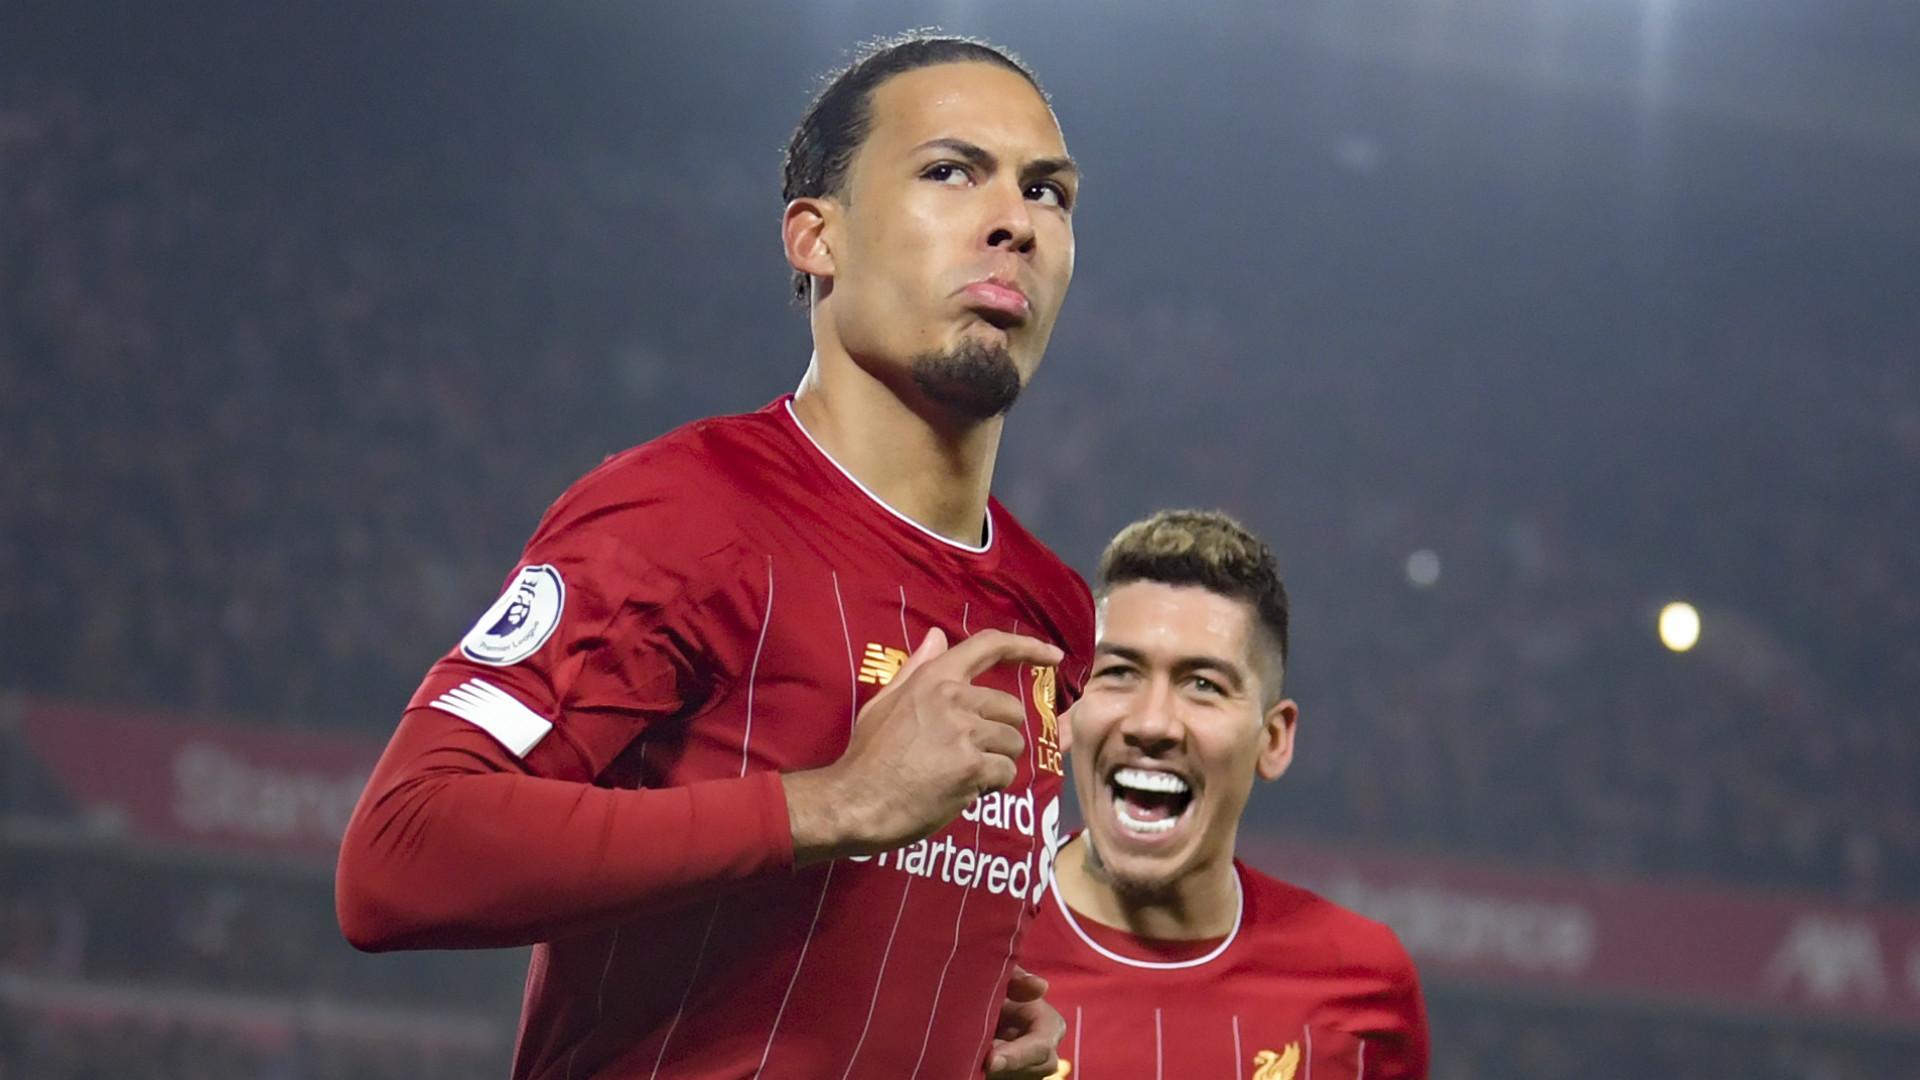 virgil van dijk liverpool 2019 20 ph0zasejc0c2101e14f01ejc6 - 'Van Dijk could beat up anybody, including Drogba' – Liverpool legend Nicol rejects Ballack's 'lucky' claim